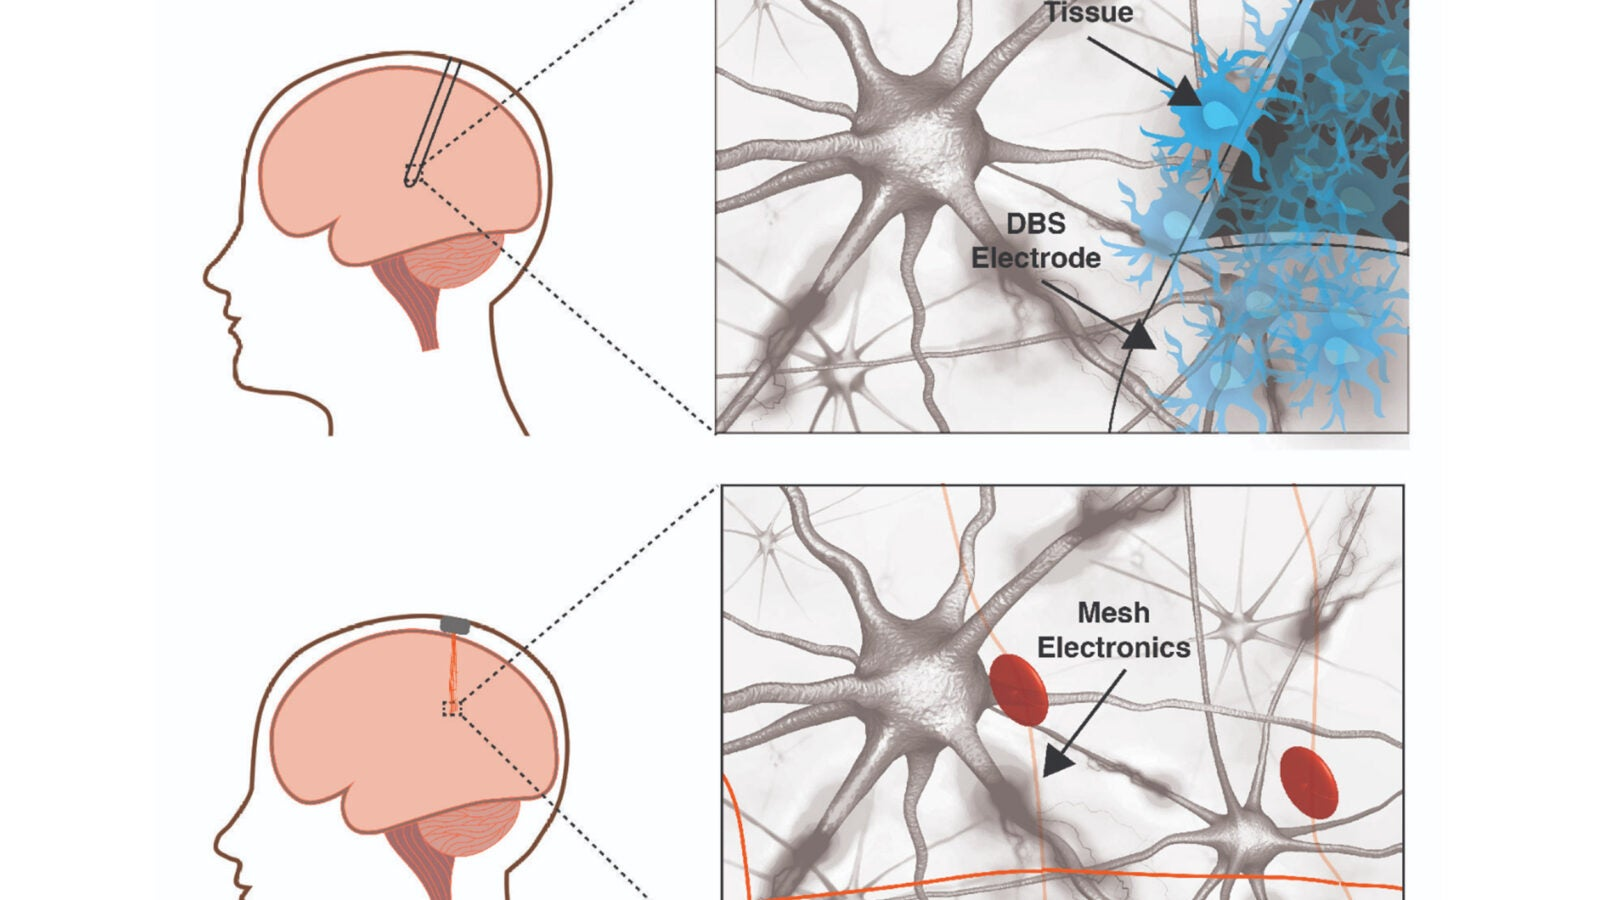 raditional-neural-electrodes-versus-mesh-electronics